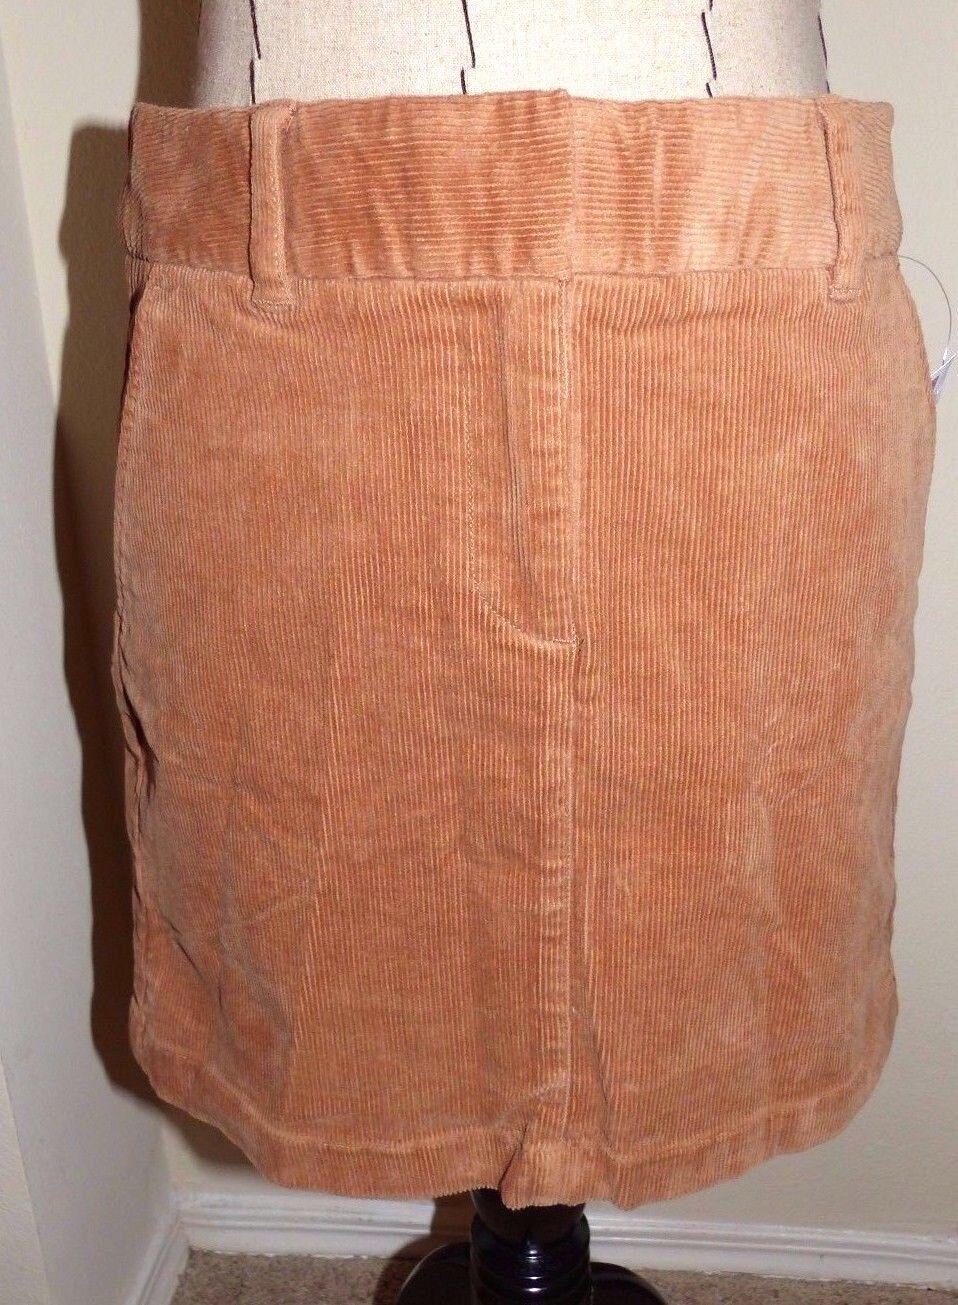 VINEYARD VINES  Ladies Corduroy Short Skirt  CAMEL  Size 8  NWT